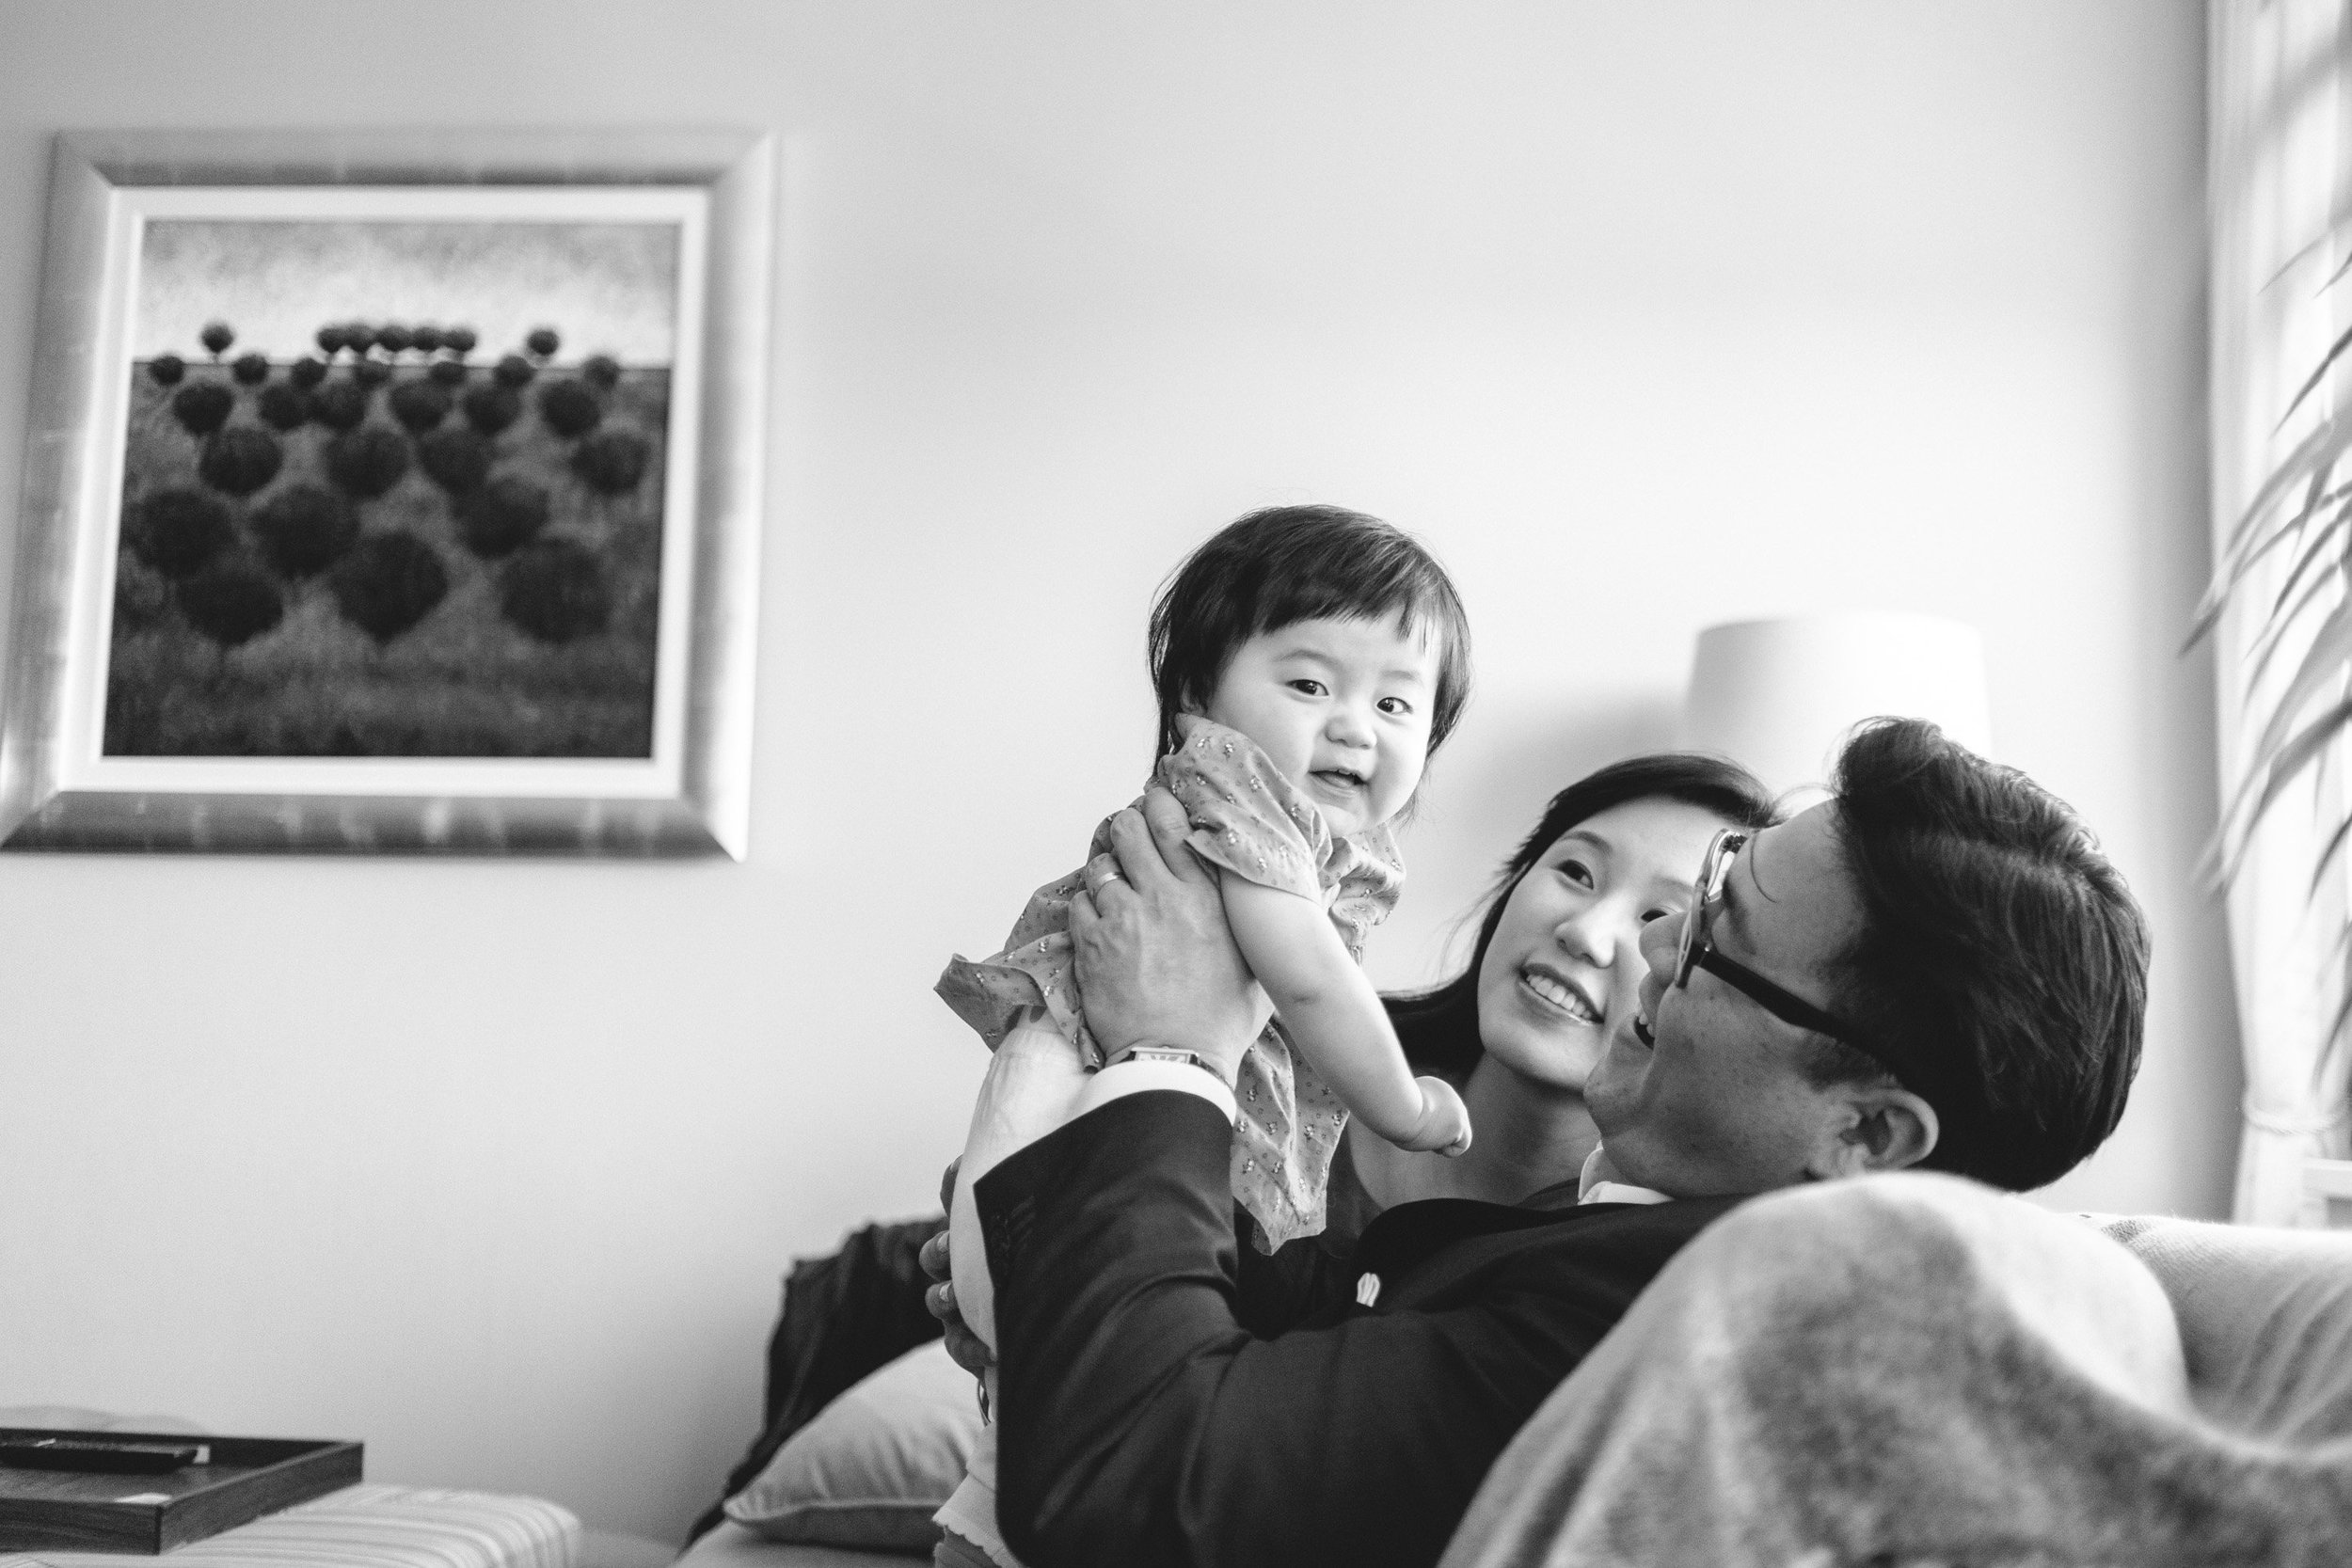 Yun Robert and Reah Family-Yun Robert and Reah-0011.jpg